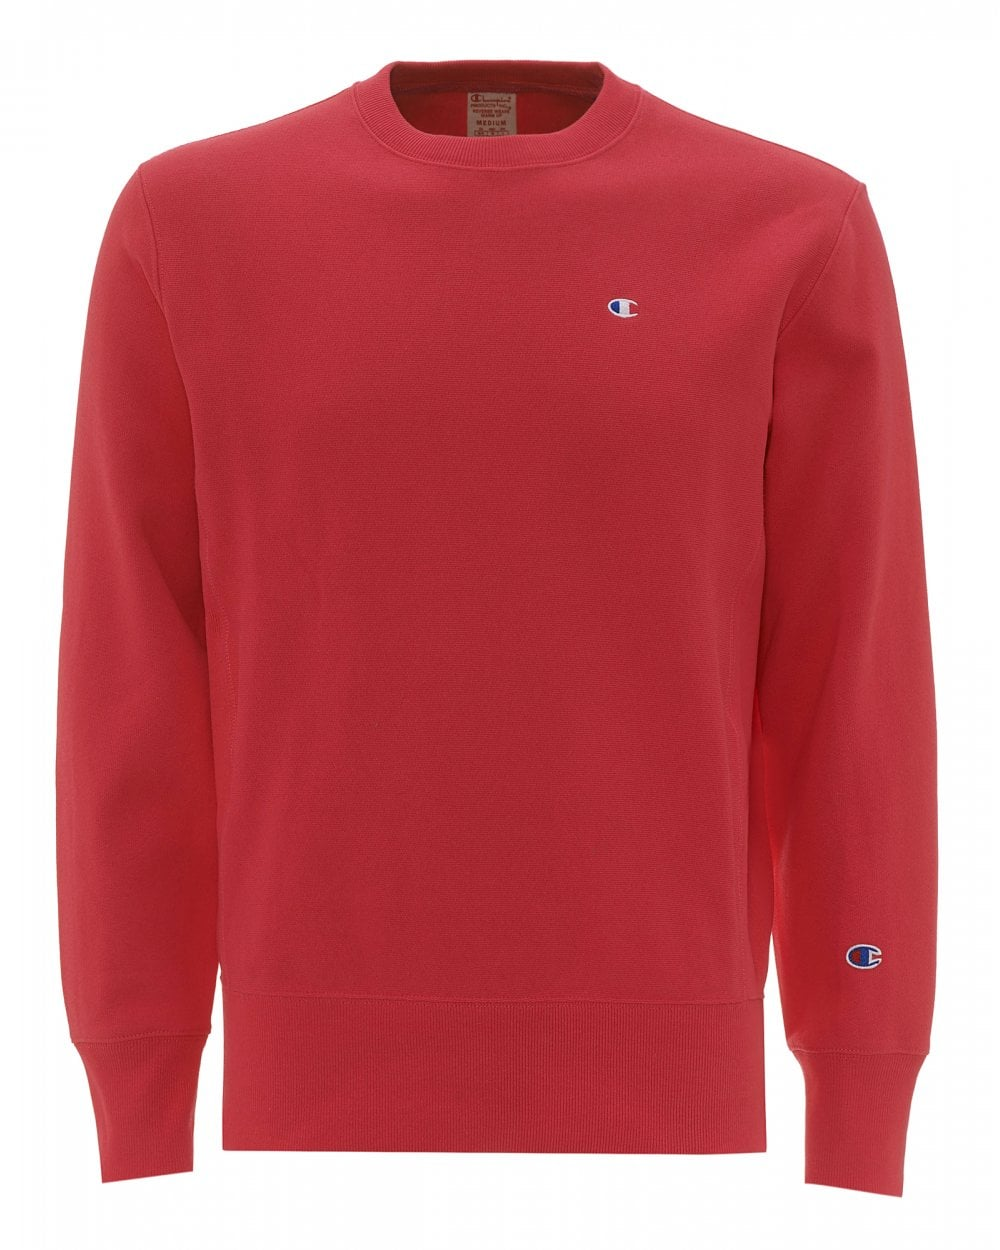 16c968024290 Champion Mens Reverse Weave Sweatshirt